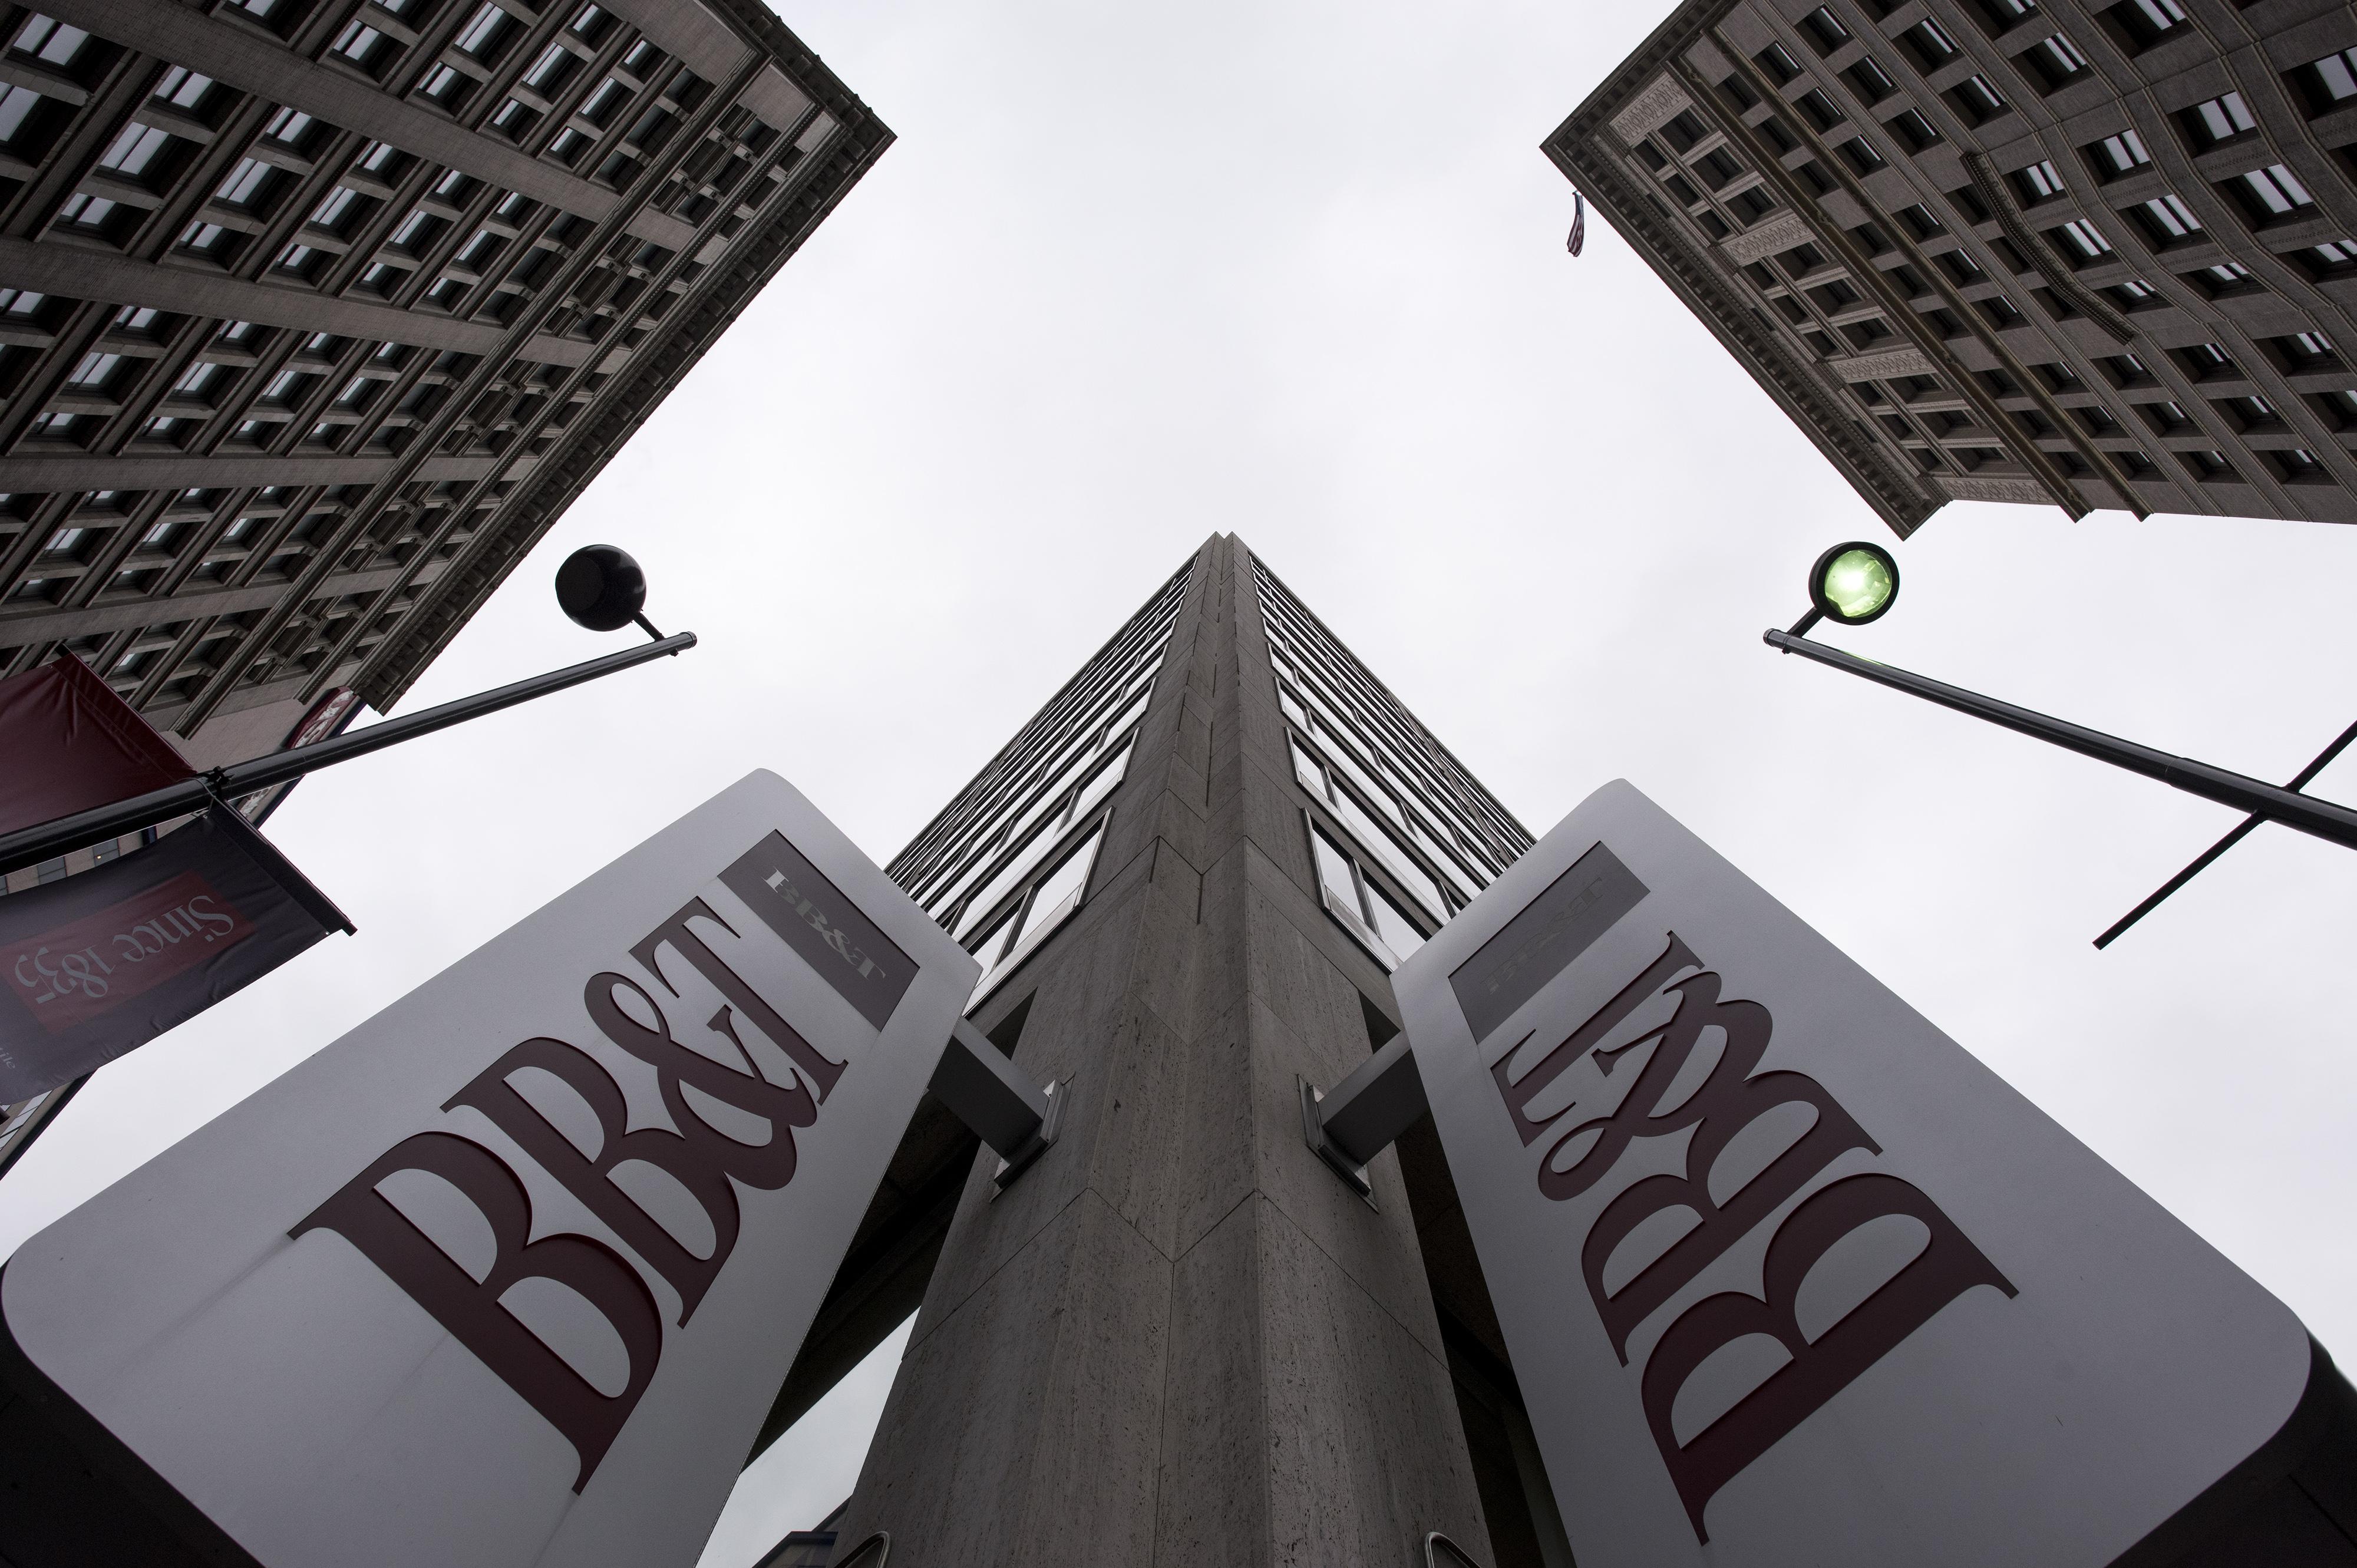 BB&T/SunTrust deal prompts questions of overlap, culture